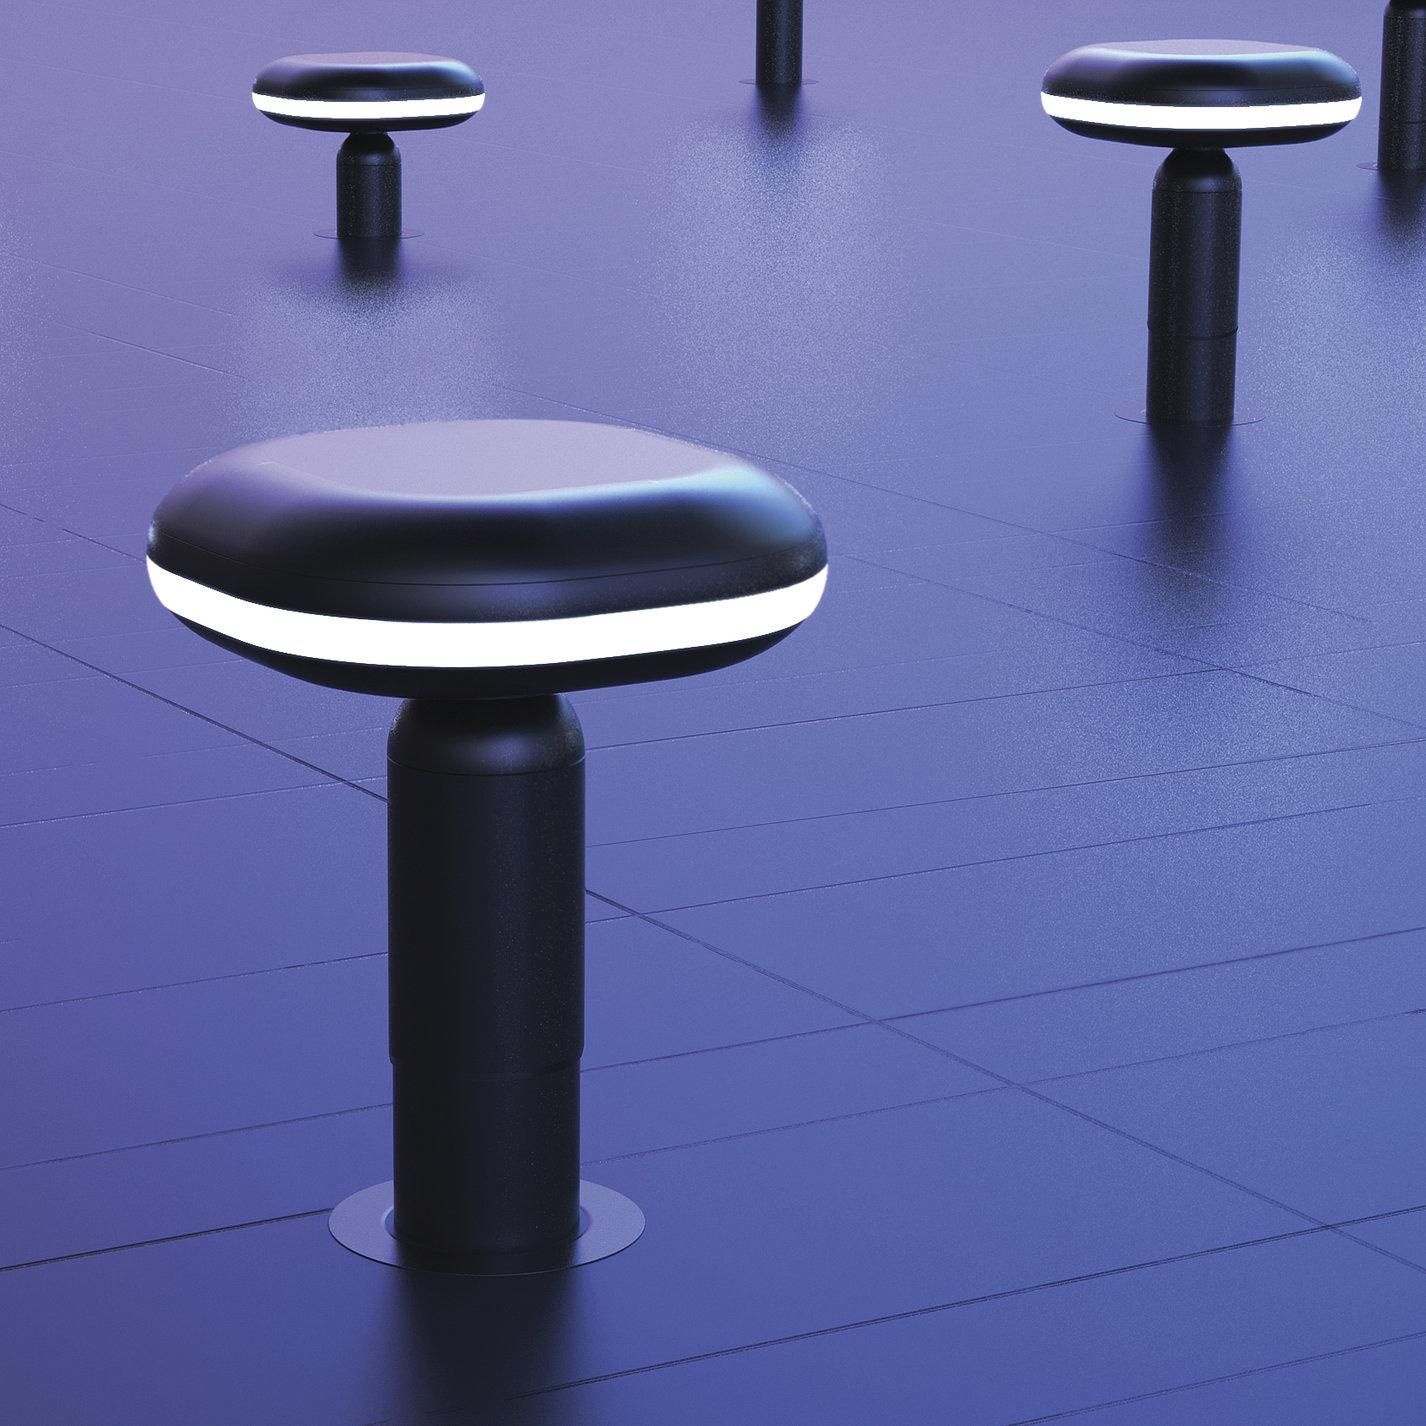 Small World - Square chair installation art | Red Dot Design Award